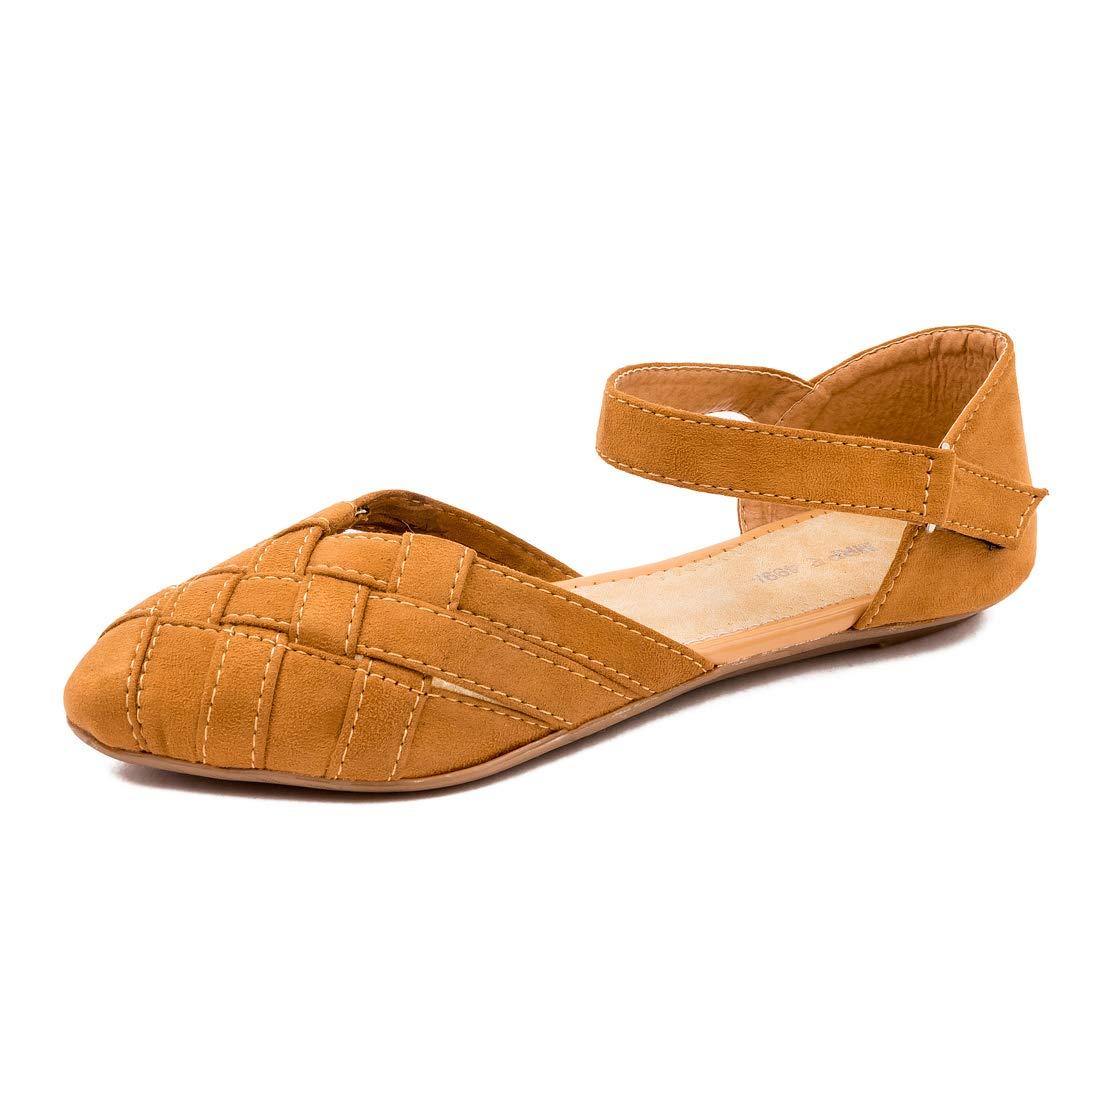 Footshez Women's Fashion Sandals-9 UK (42 EU) (10 US) (F-829-BEIGE (B07HWLNGM1) Amazon Price History, Amazon Price Tracker